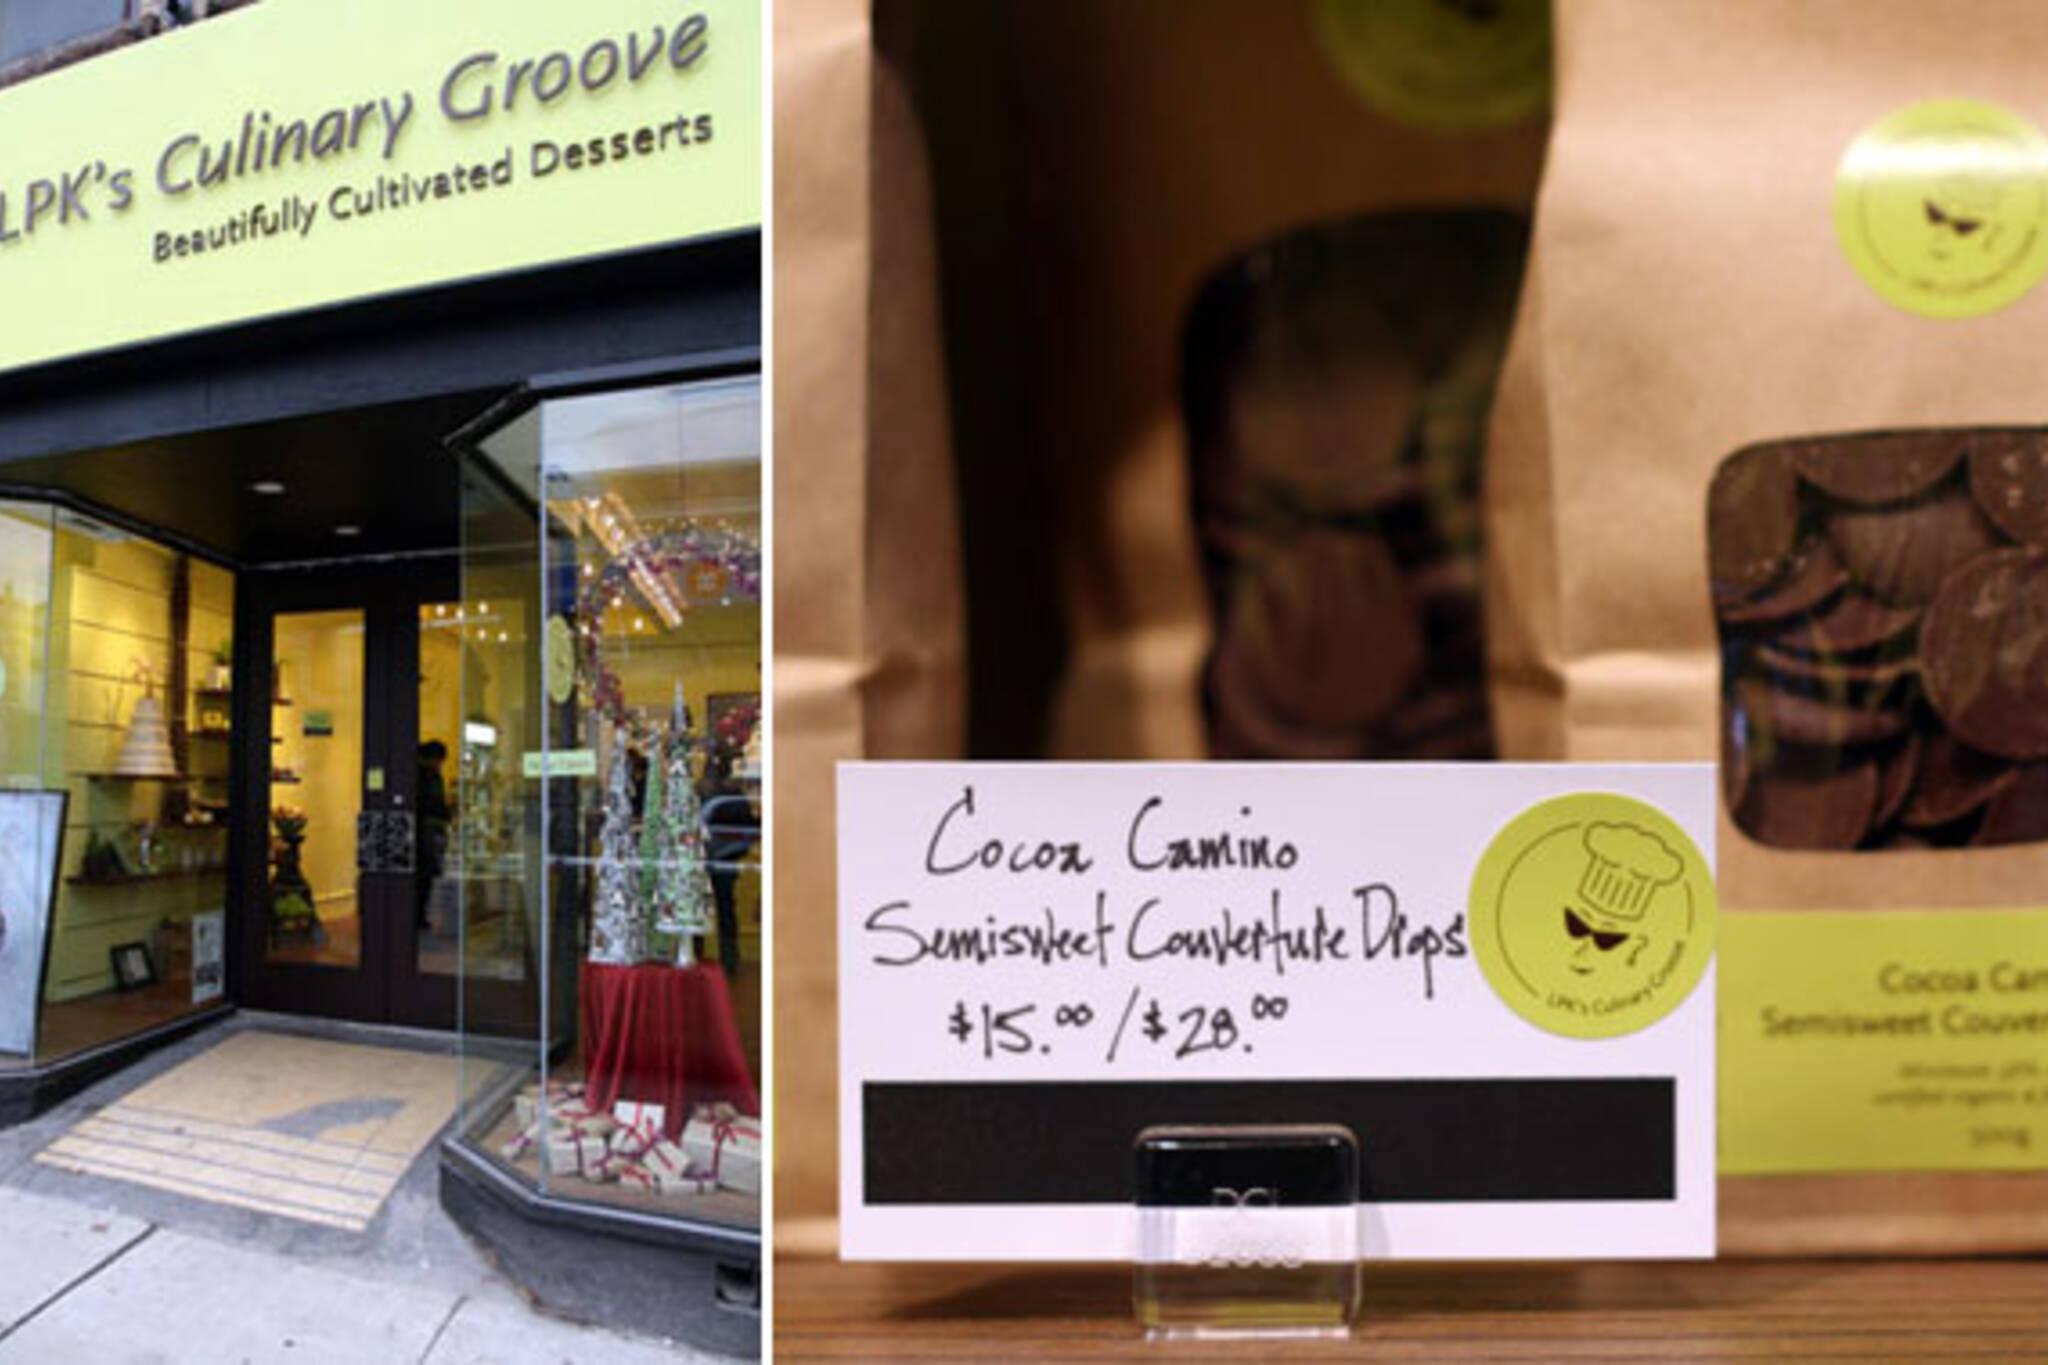 LPK's Culinary Groove